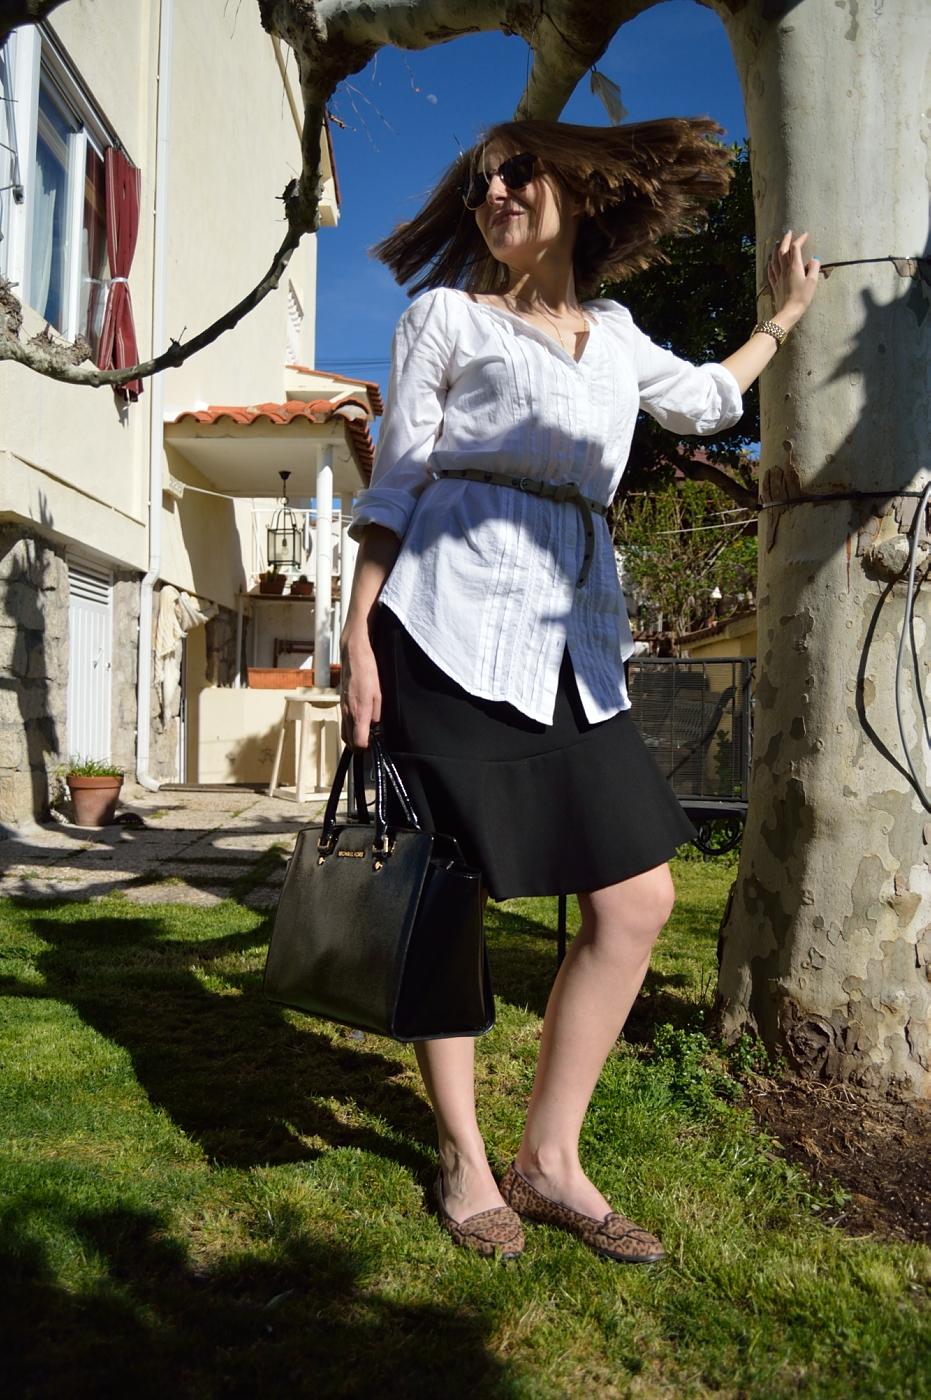 lara-vazquez-mad-lula-style-look-ootd-fashionblog-white-black-attire